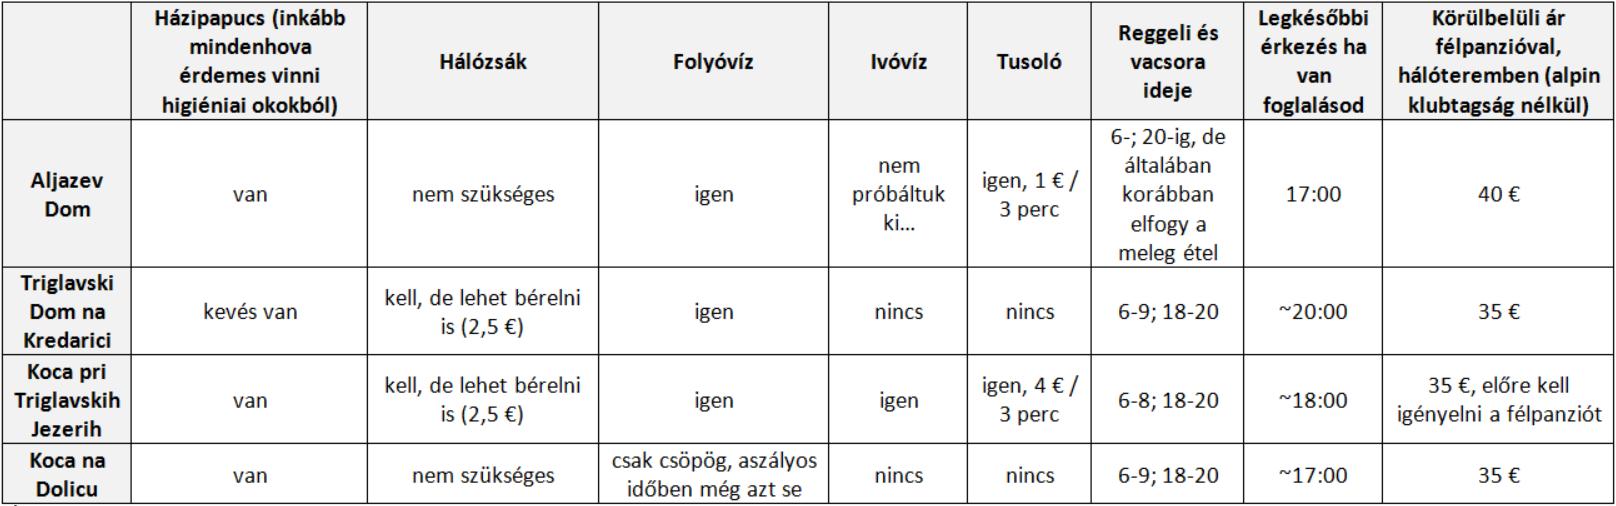 infok.PNG